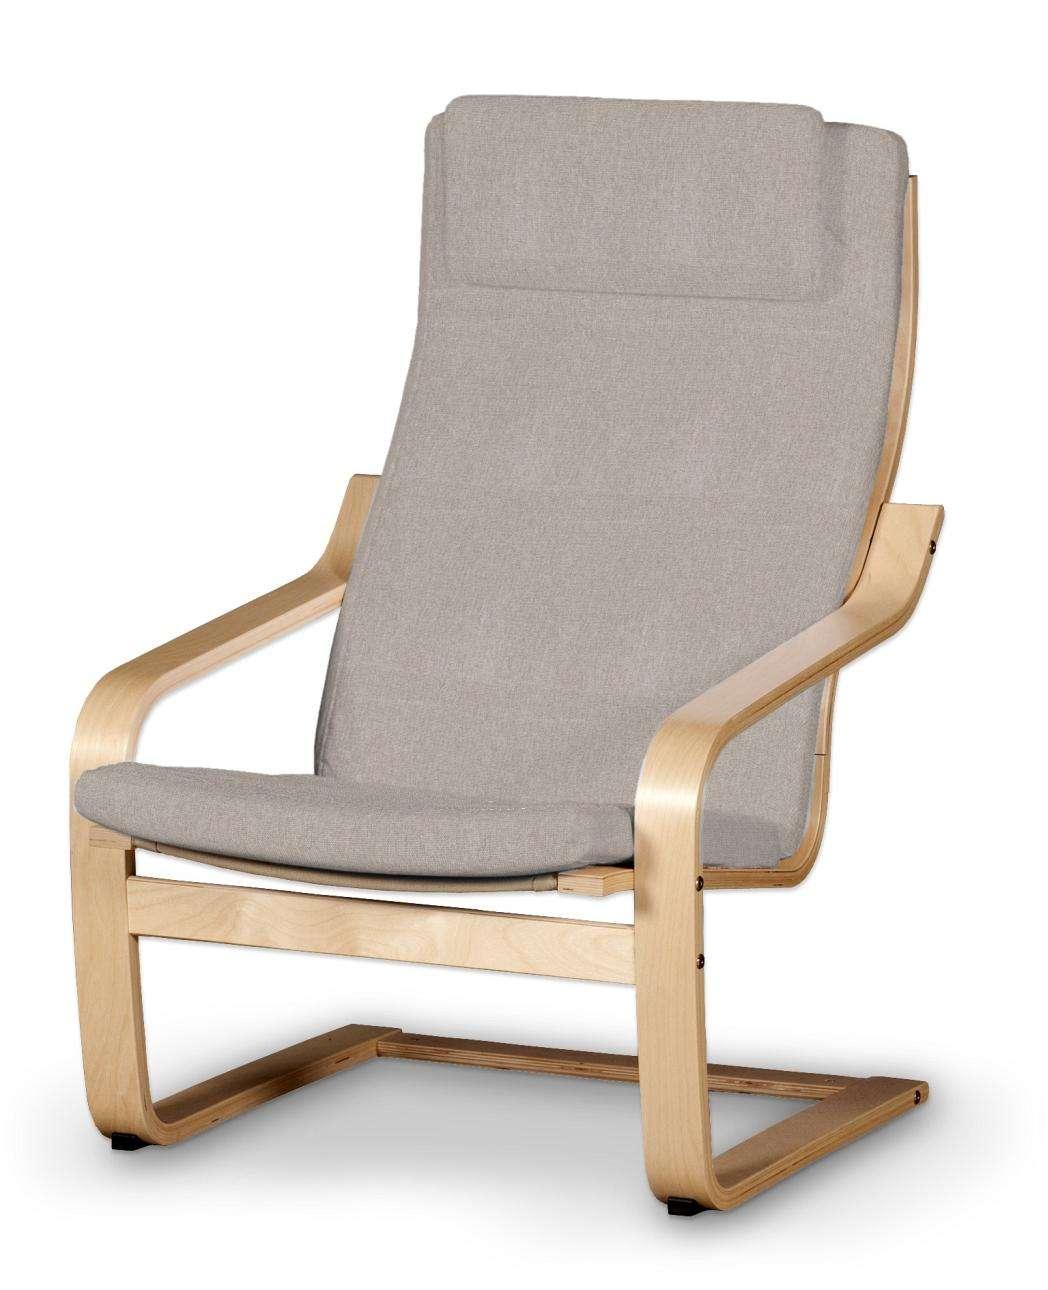 Poduszka na fotel Poäng II Fotel Poäng II w kolekcji Etna , tkanina: 705-09